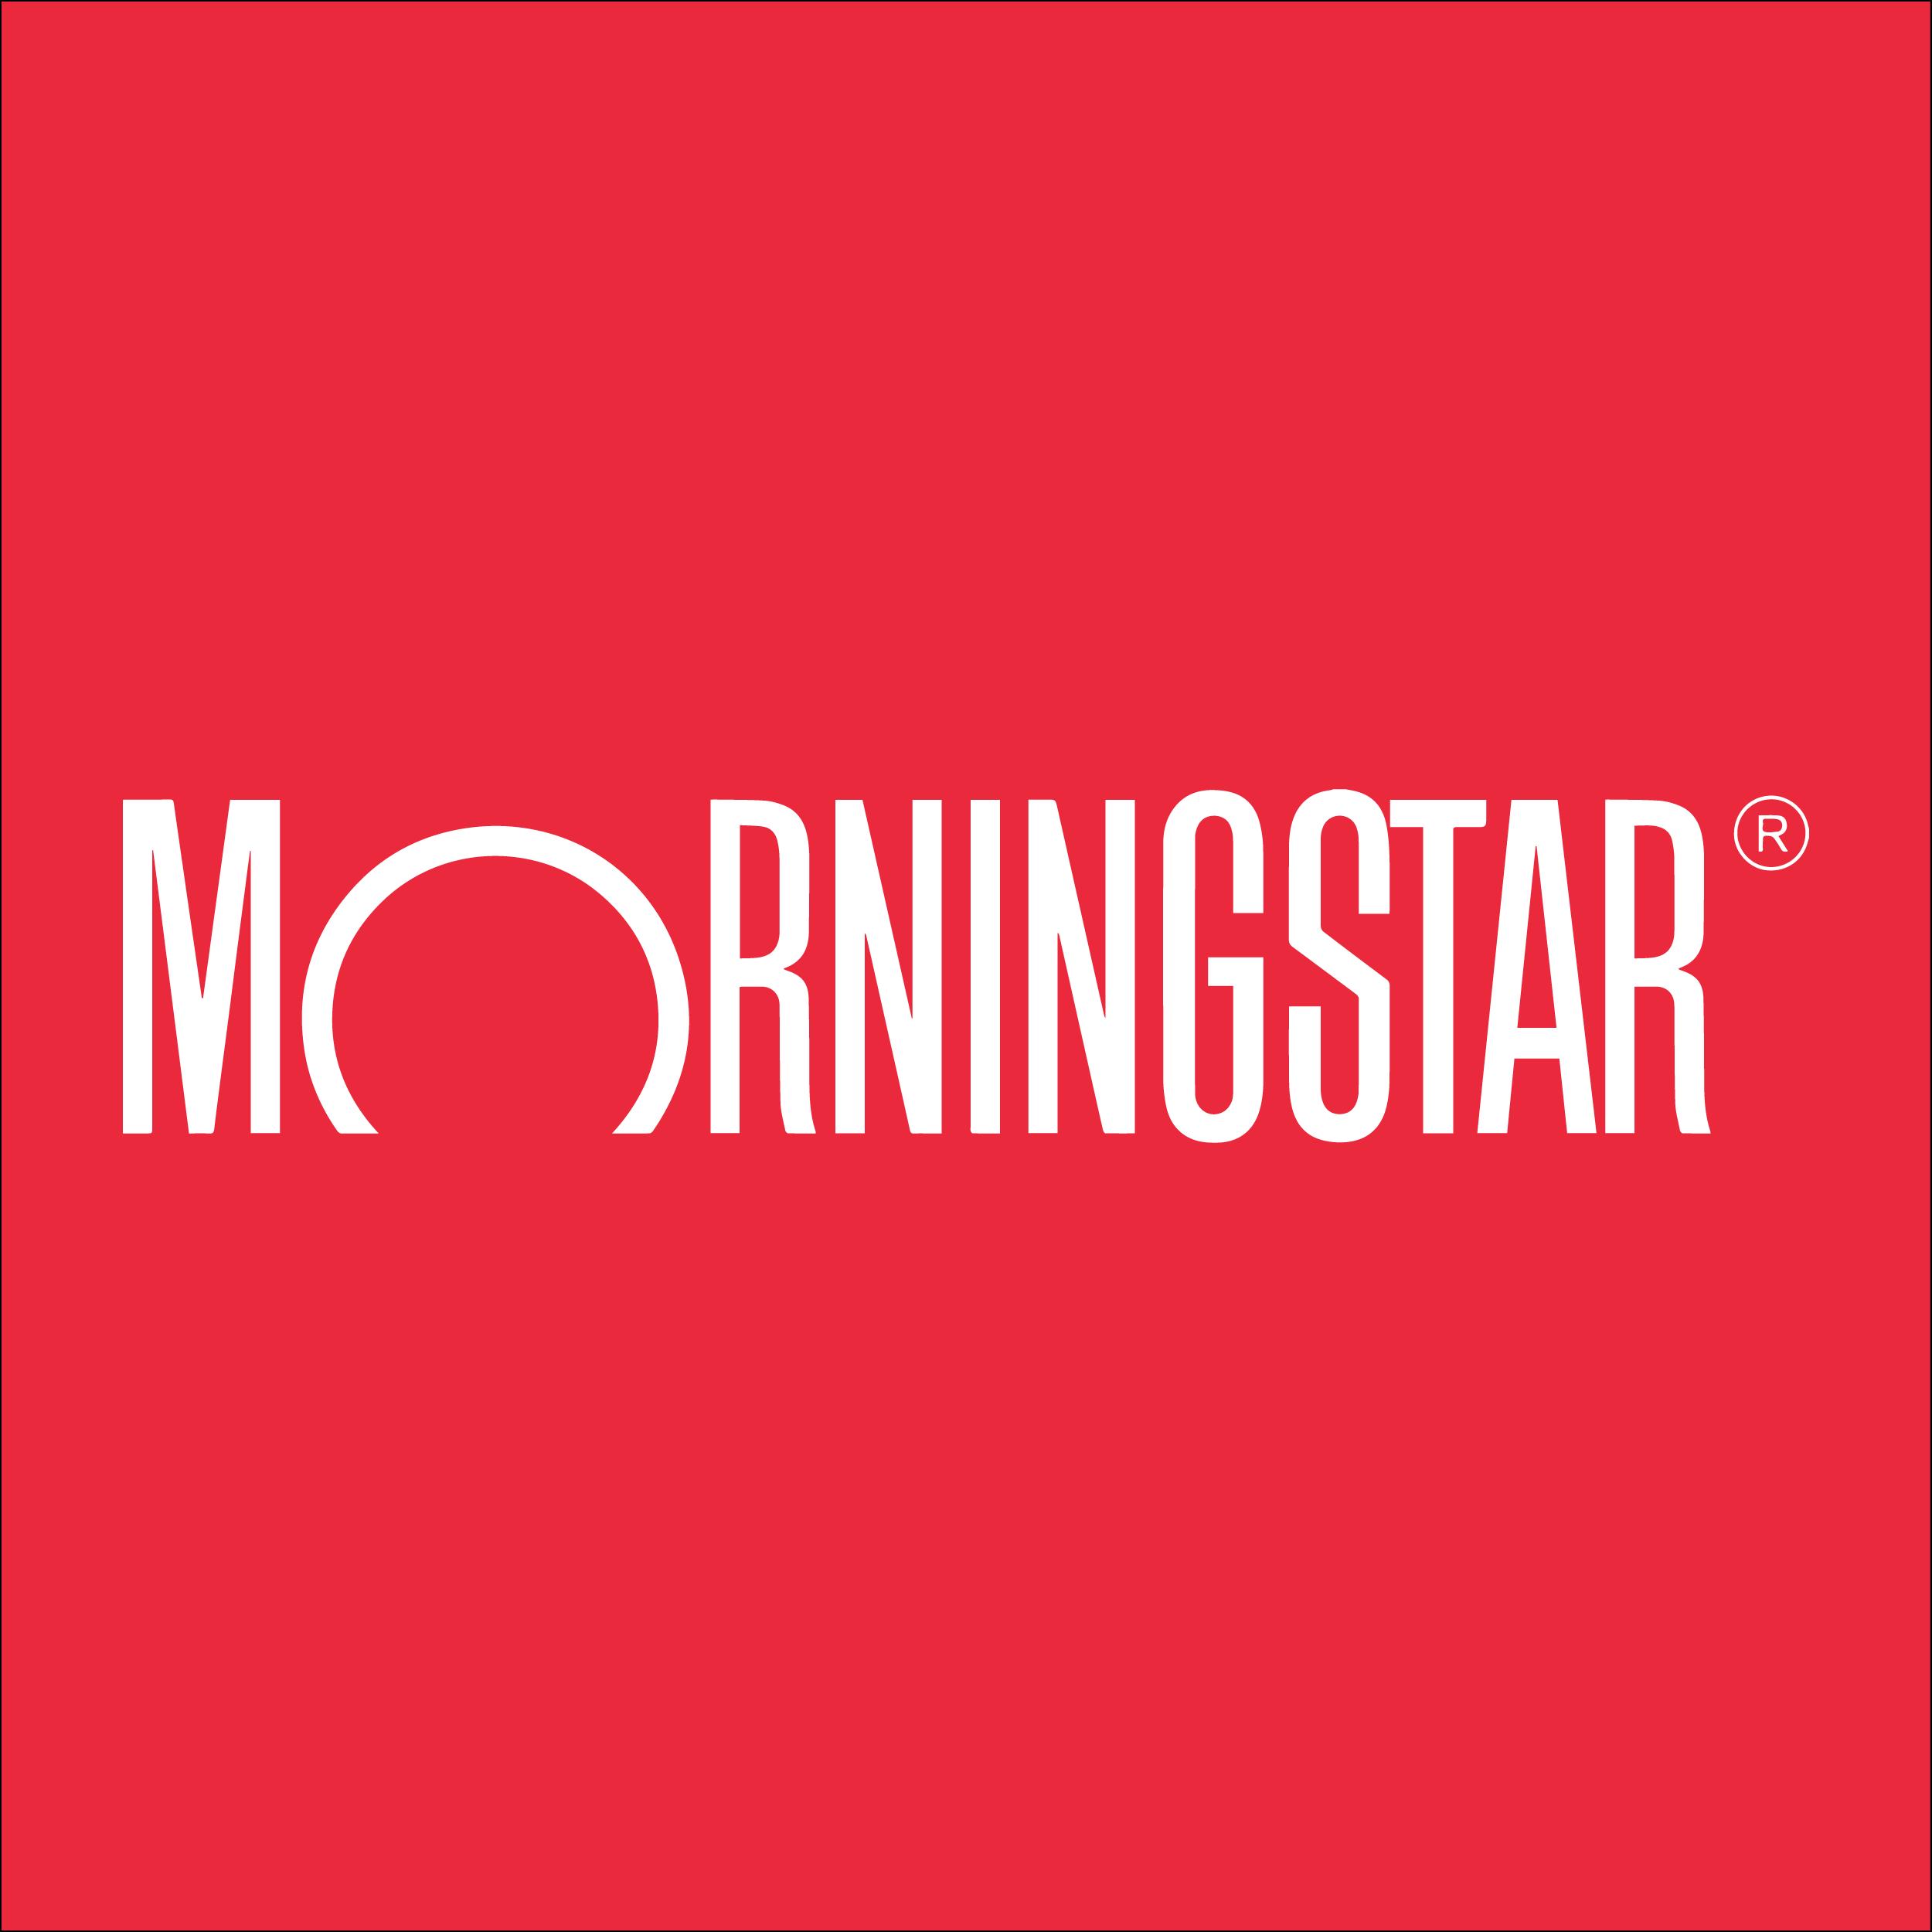 morningstar_square2-01.png